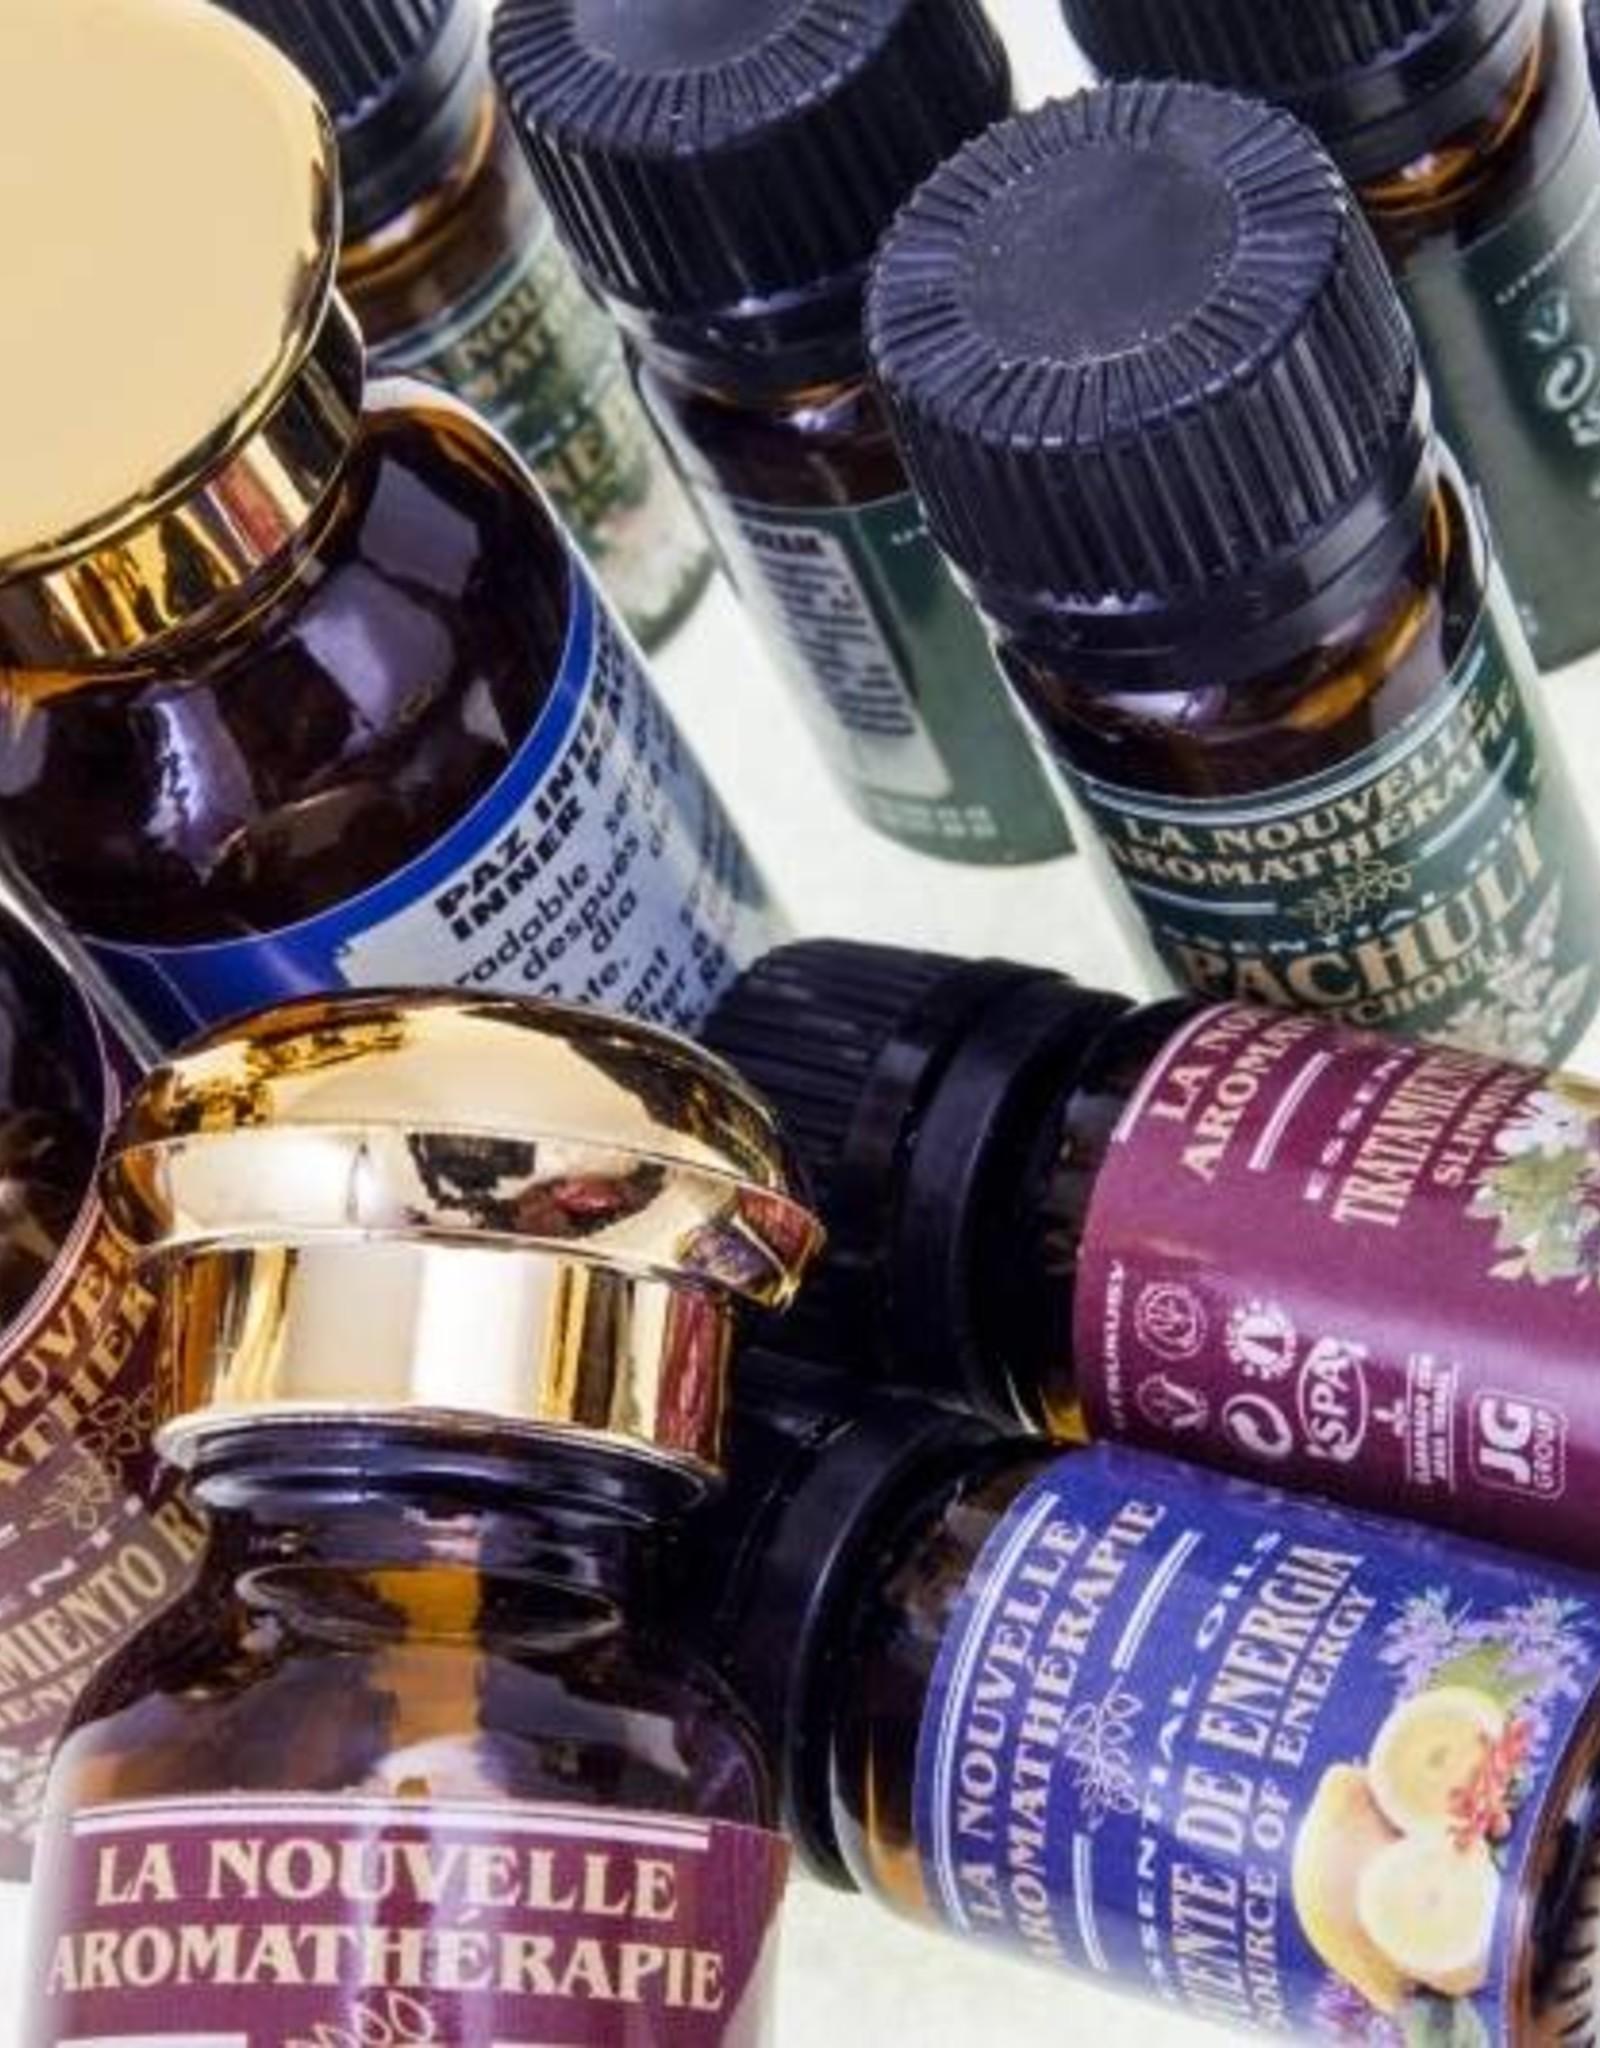 Utsukusy Nutmeg essential oil 6ml